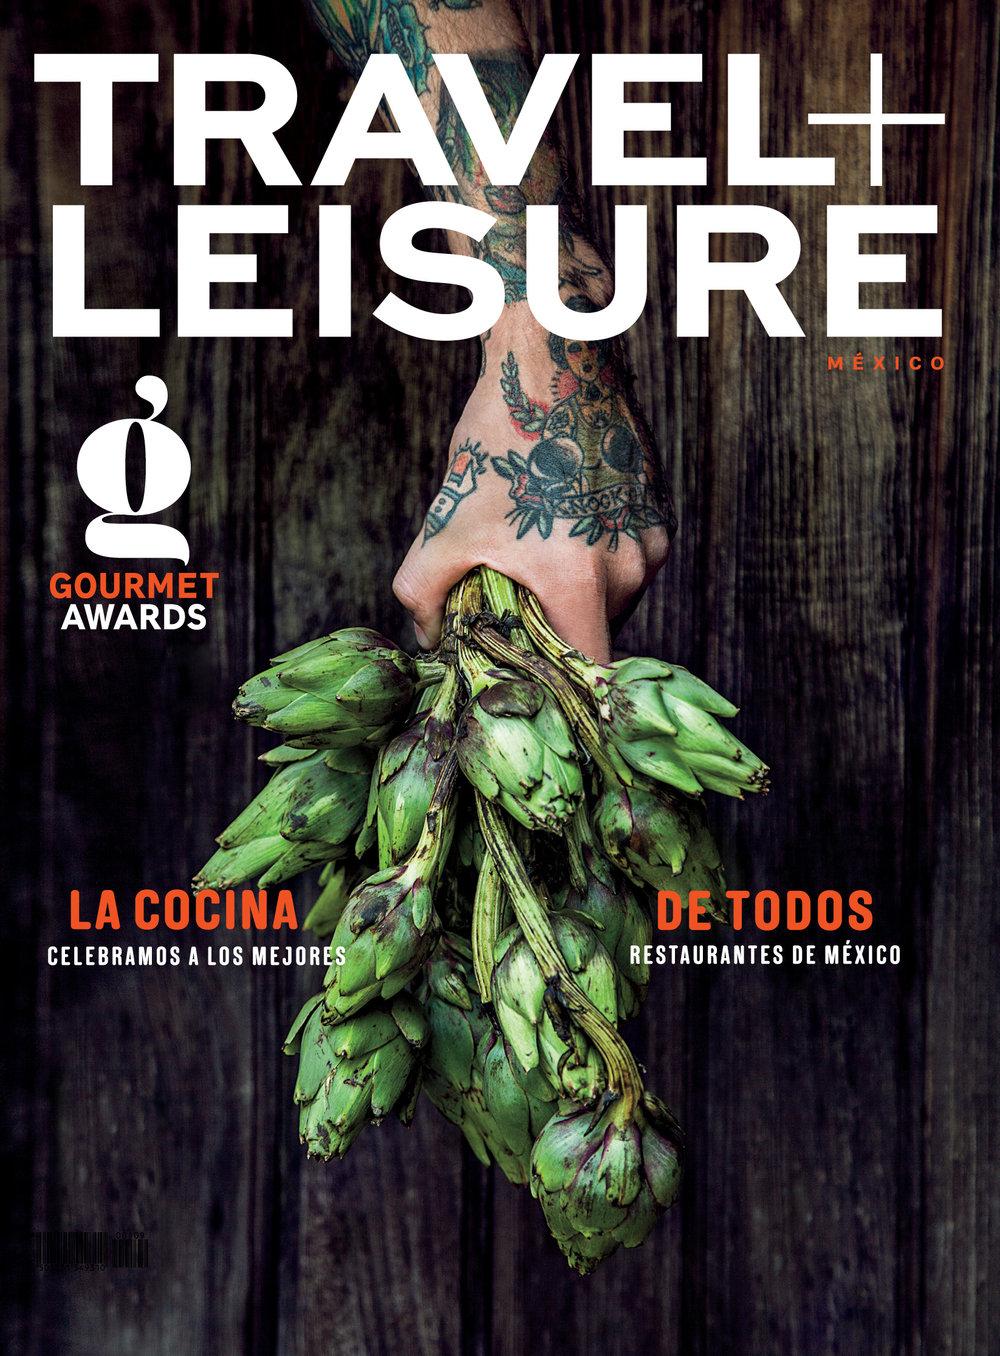 Travel + Leisure Mexico Magazine_November 2017_Cover.JPG